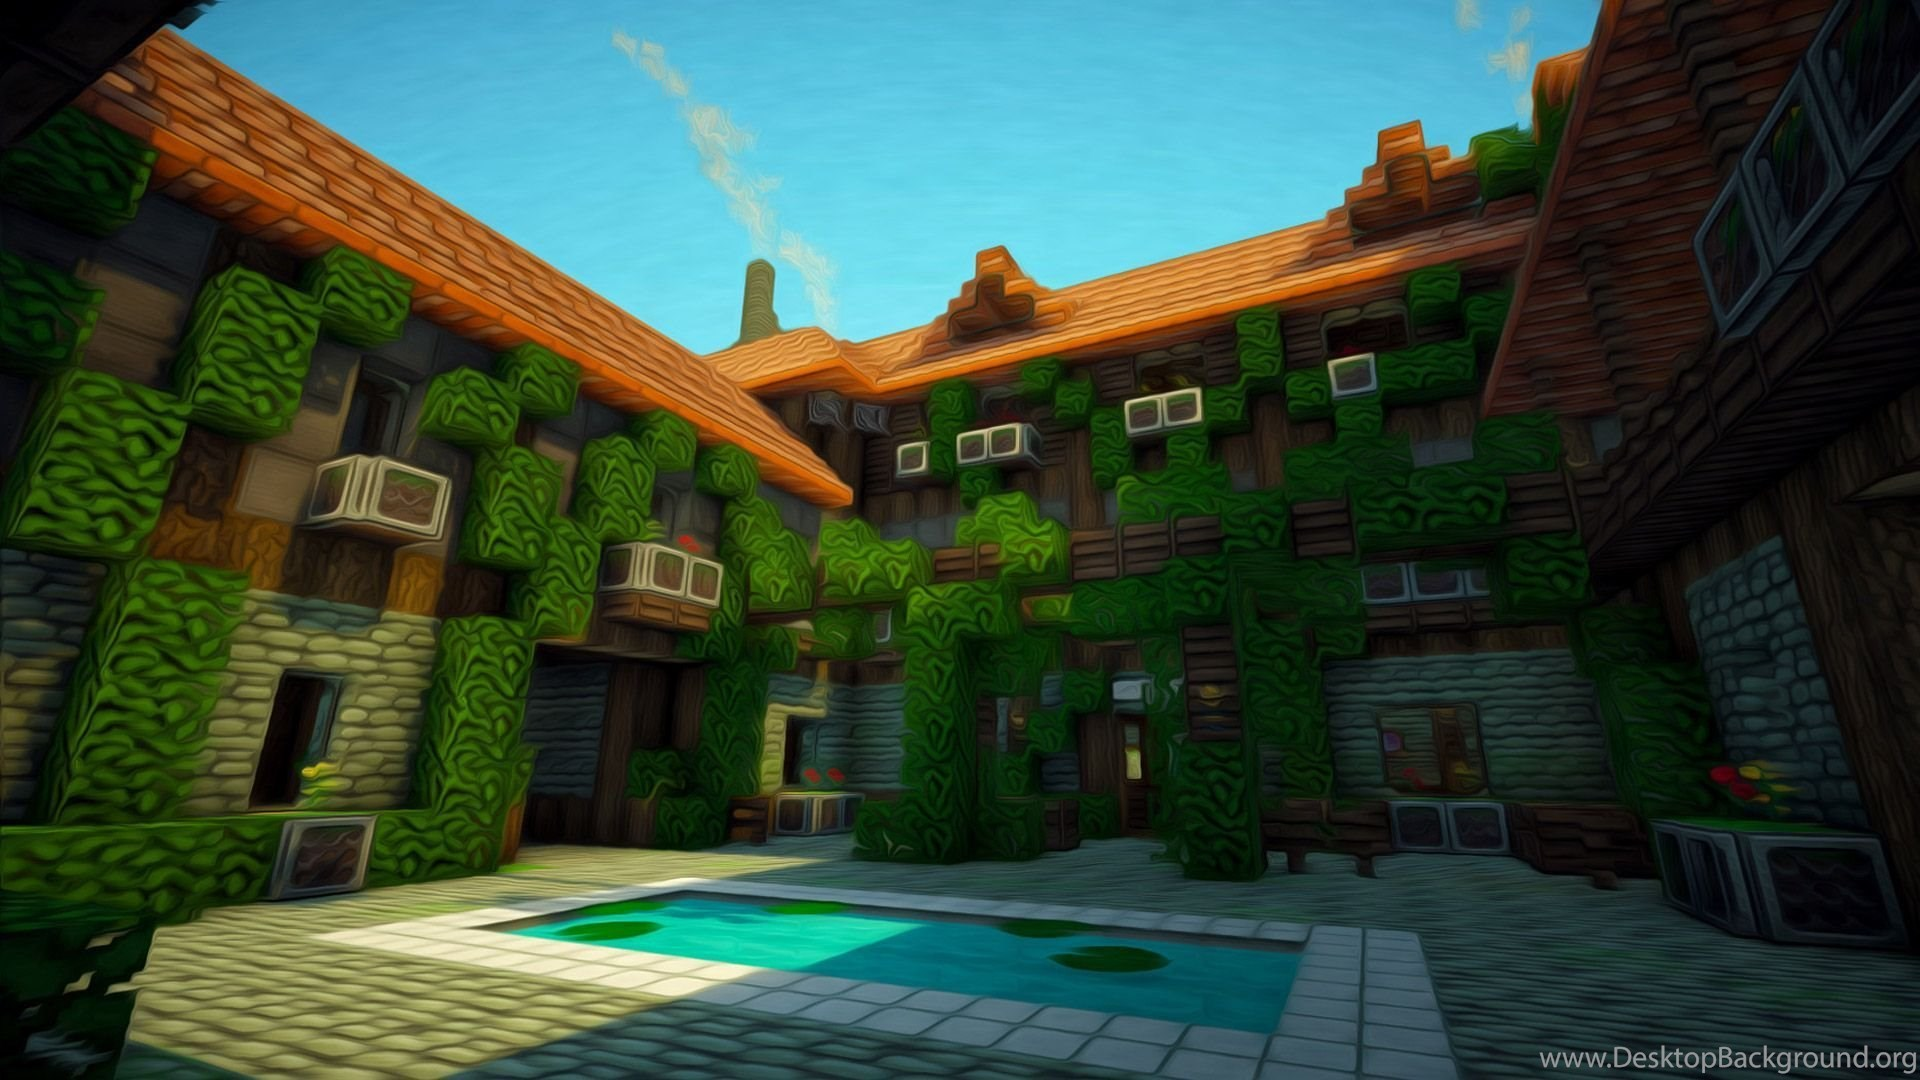 Minecraft Wallpapers HD Free Download For Desktop Desktop